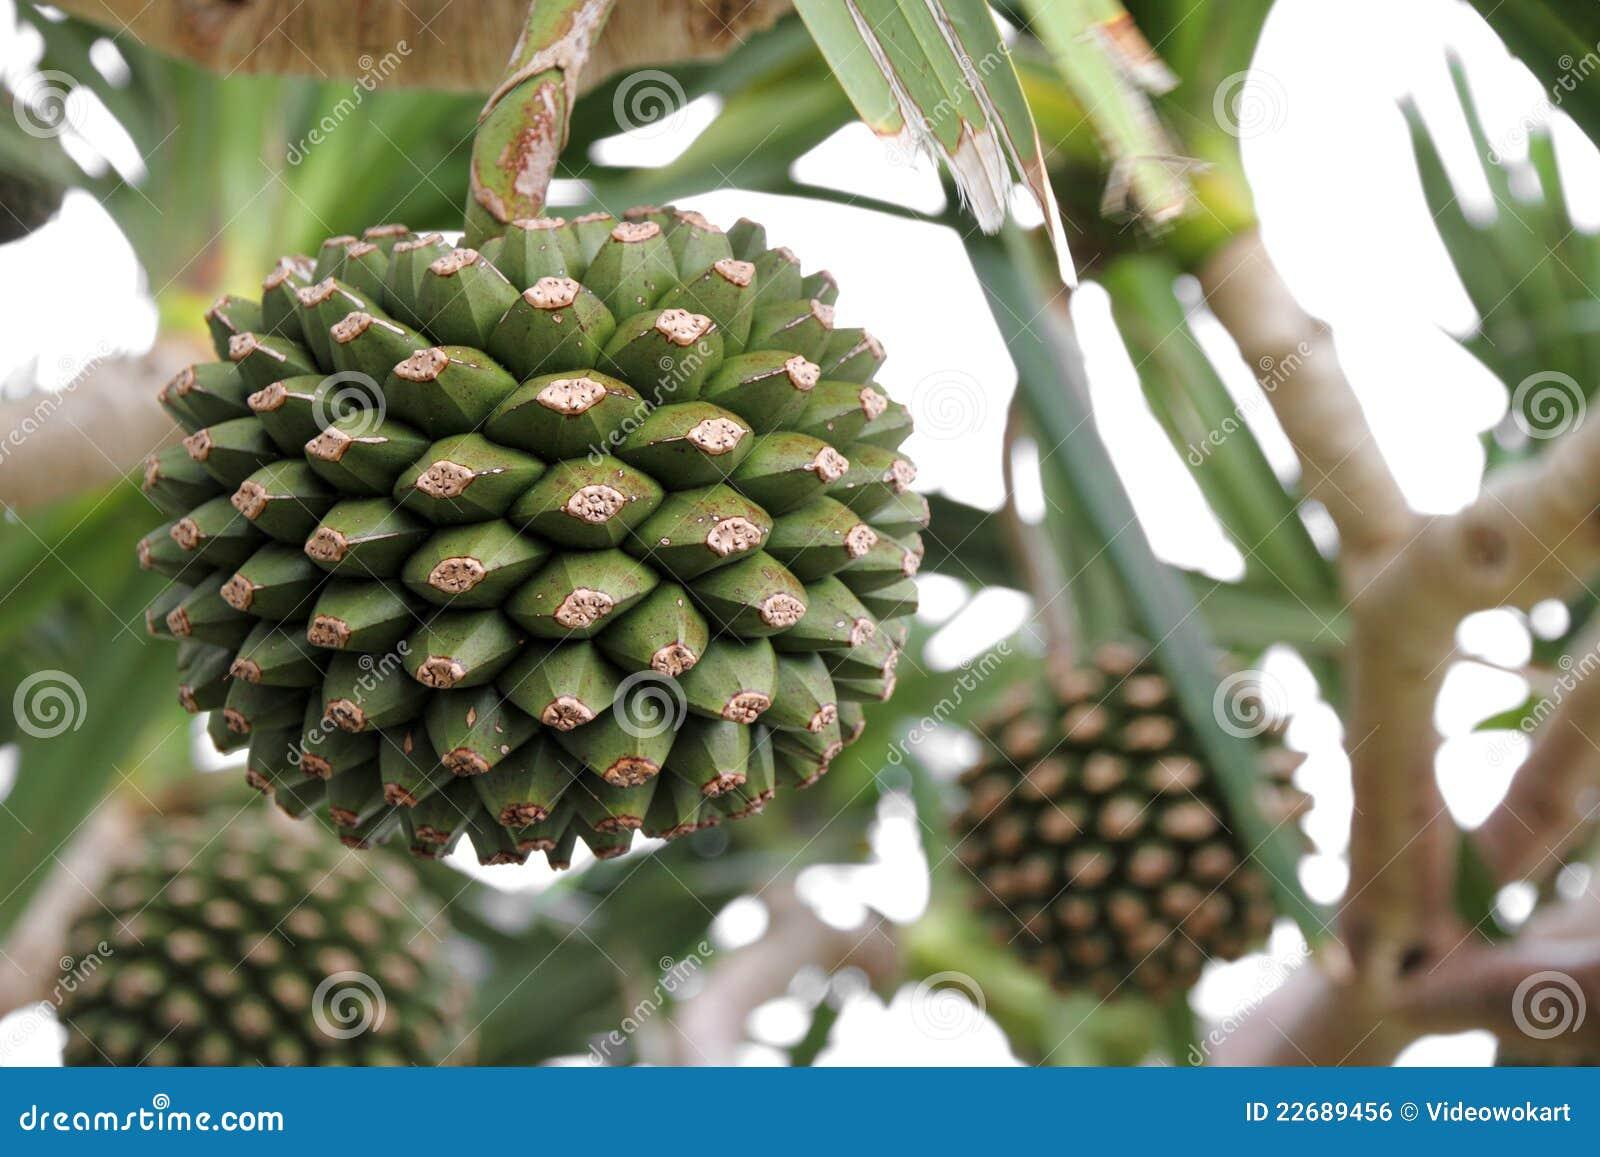 Adan Fruit Tree Royalty Free Stock Image - Image: 22689456